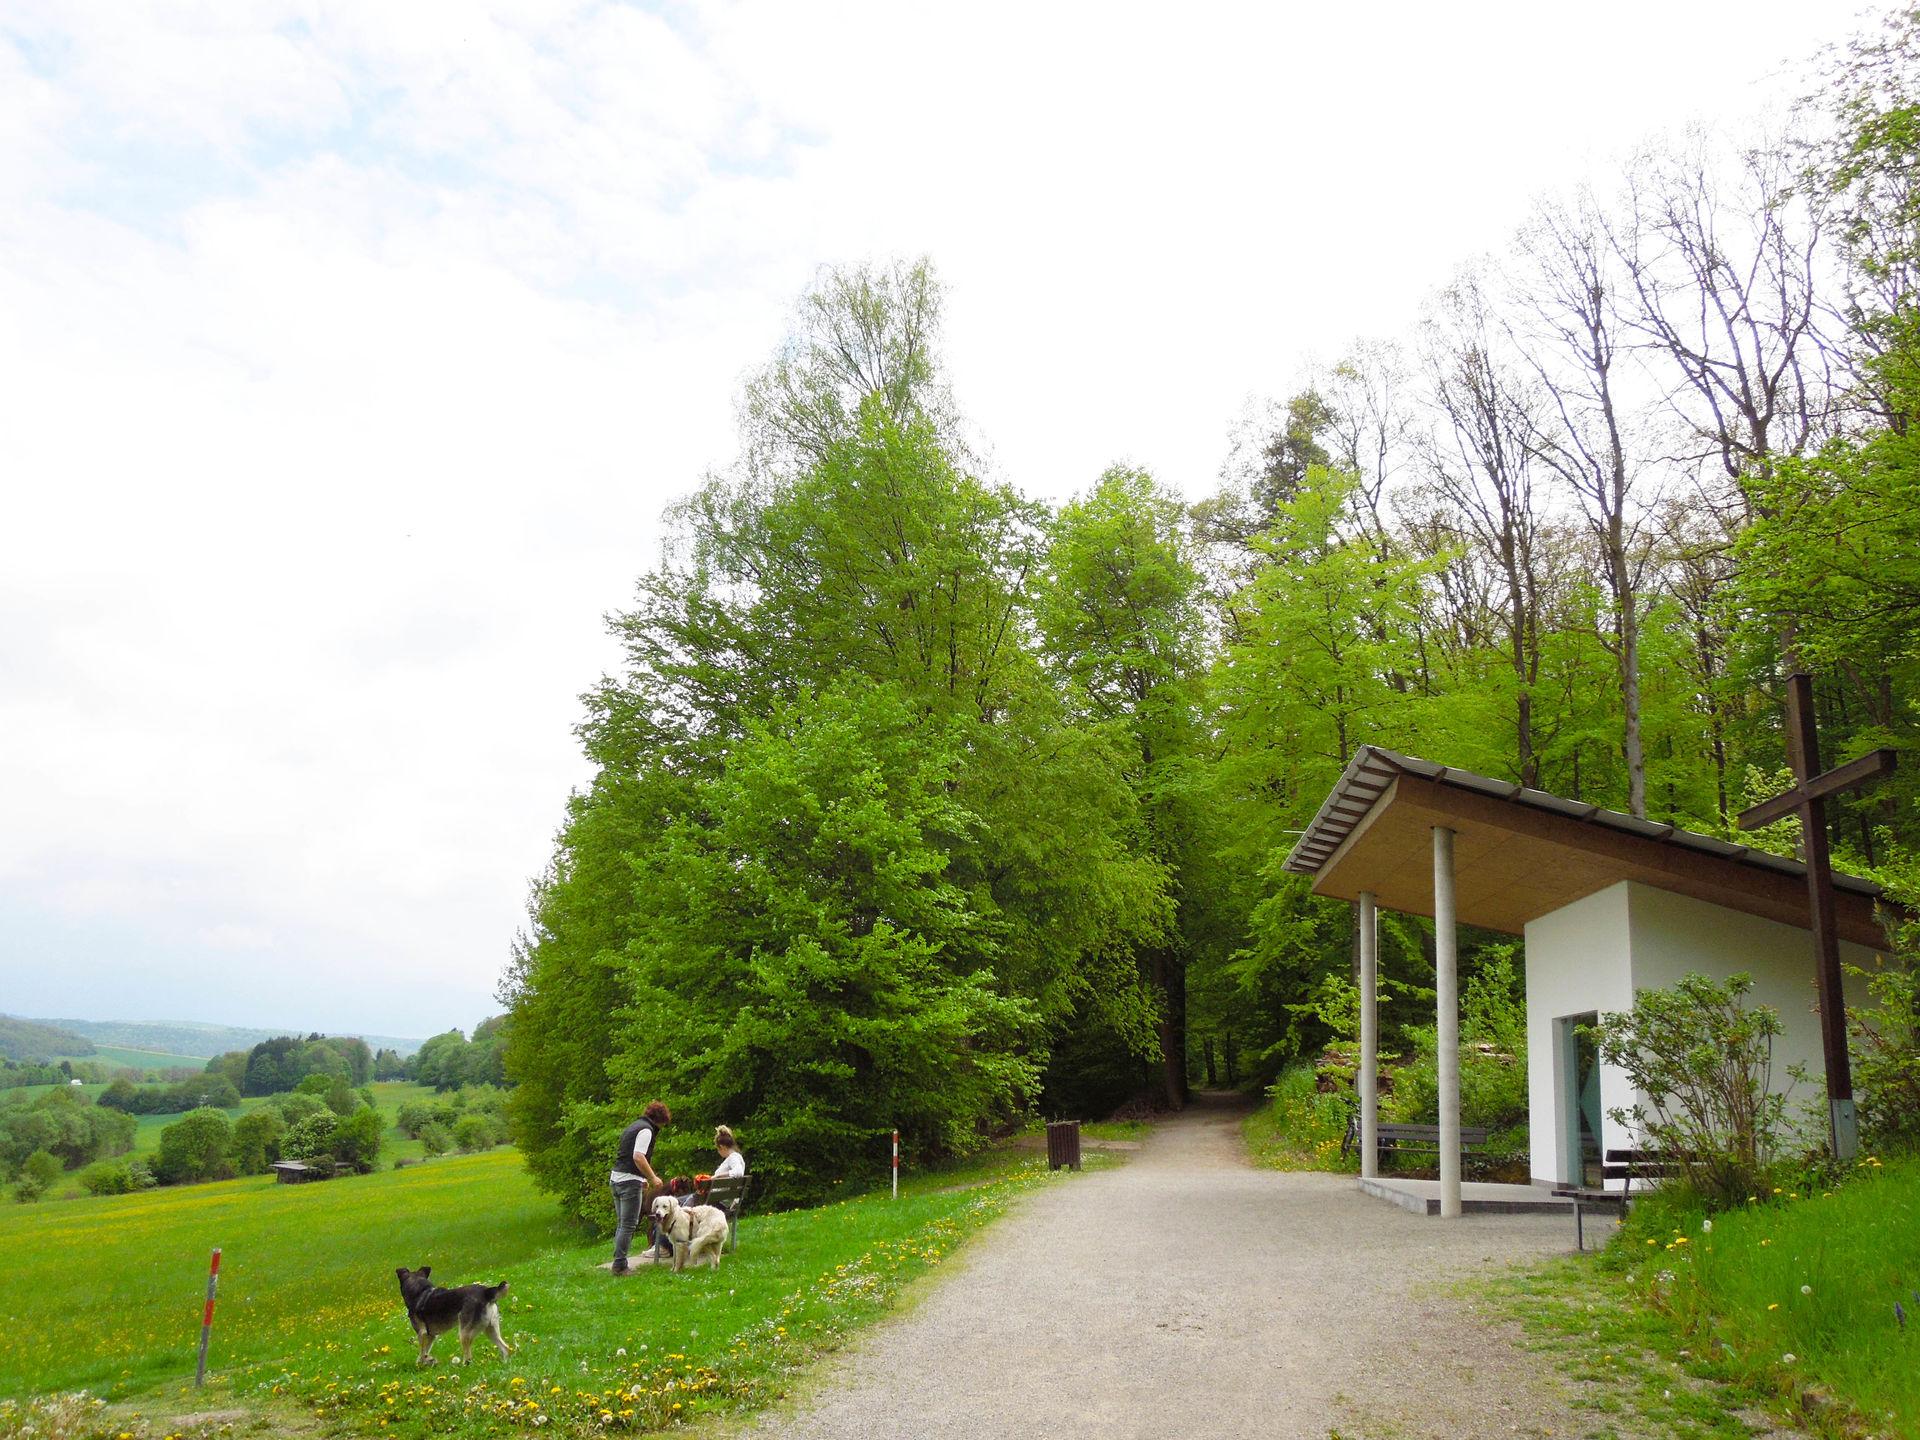 Foto des Eingangs zur Kolpingkapelle Bad Kissingen